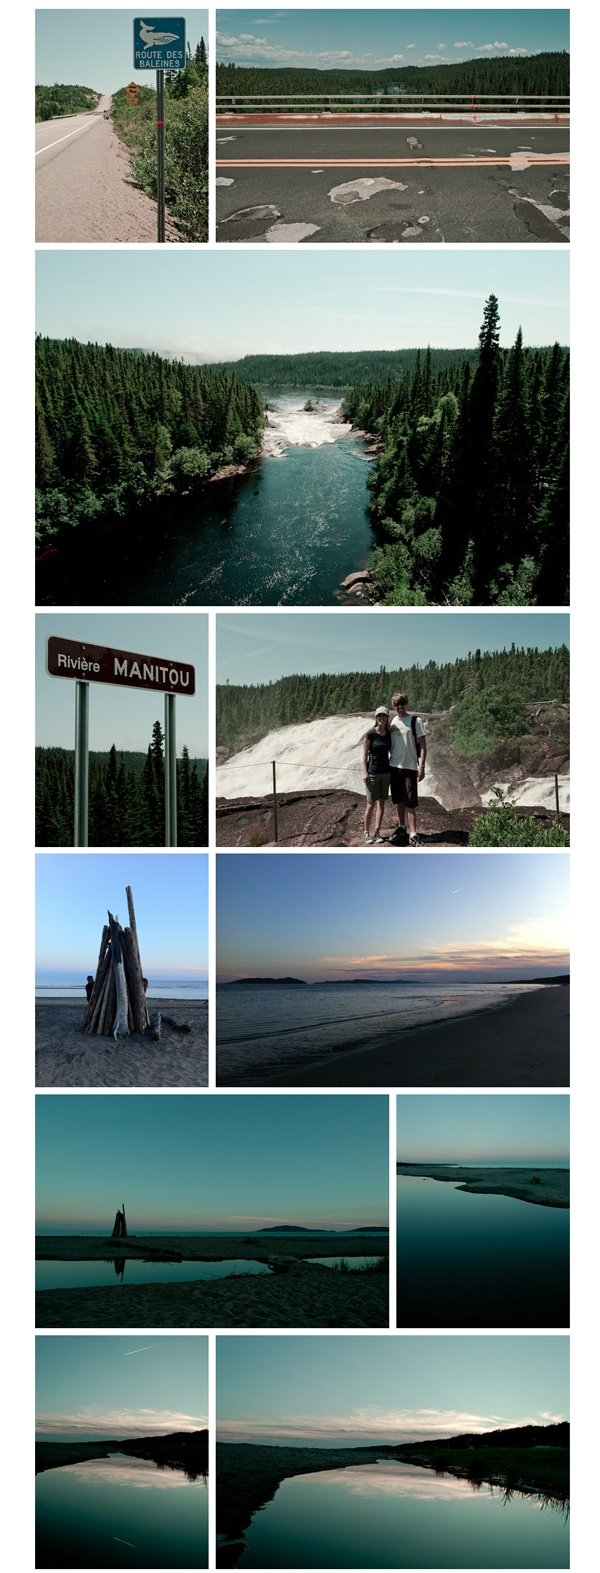 Sept-Iles by Modernhippie.me #travel #modernhippie #photography #canada